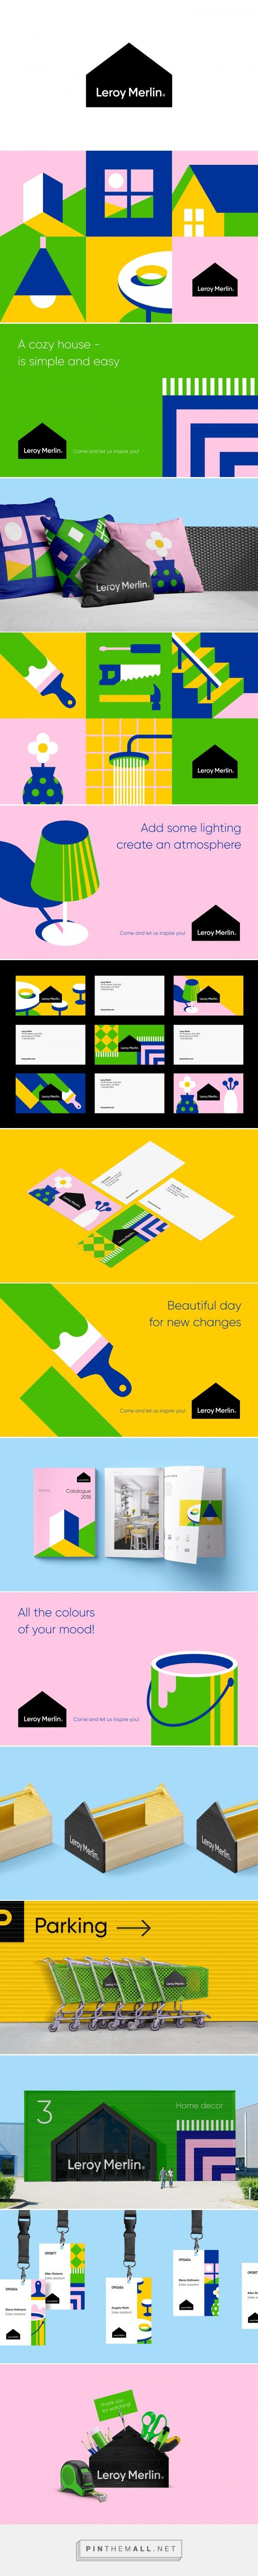 Leroy Merlin Home Goods Retailer Branding By Berik Yergaliyev Identity Design Logo Branding Design Branding Design Logo